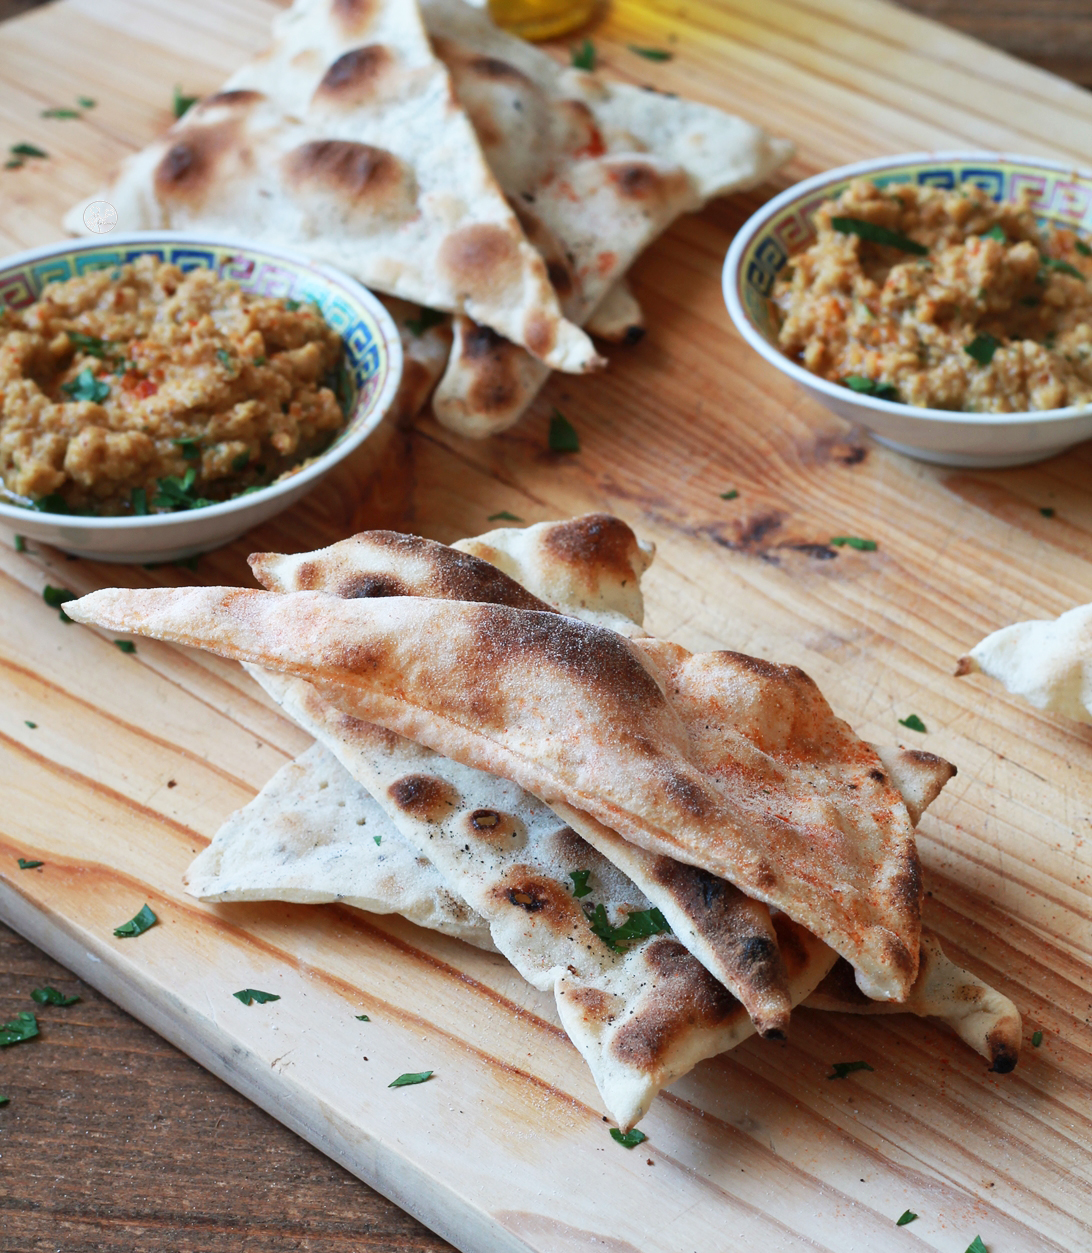 Flatbread senza glutine - La Cassata Celiaca